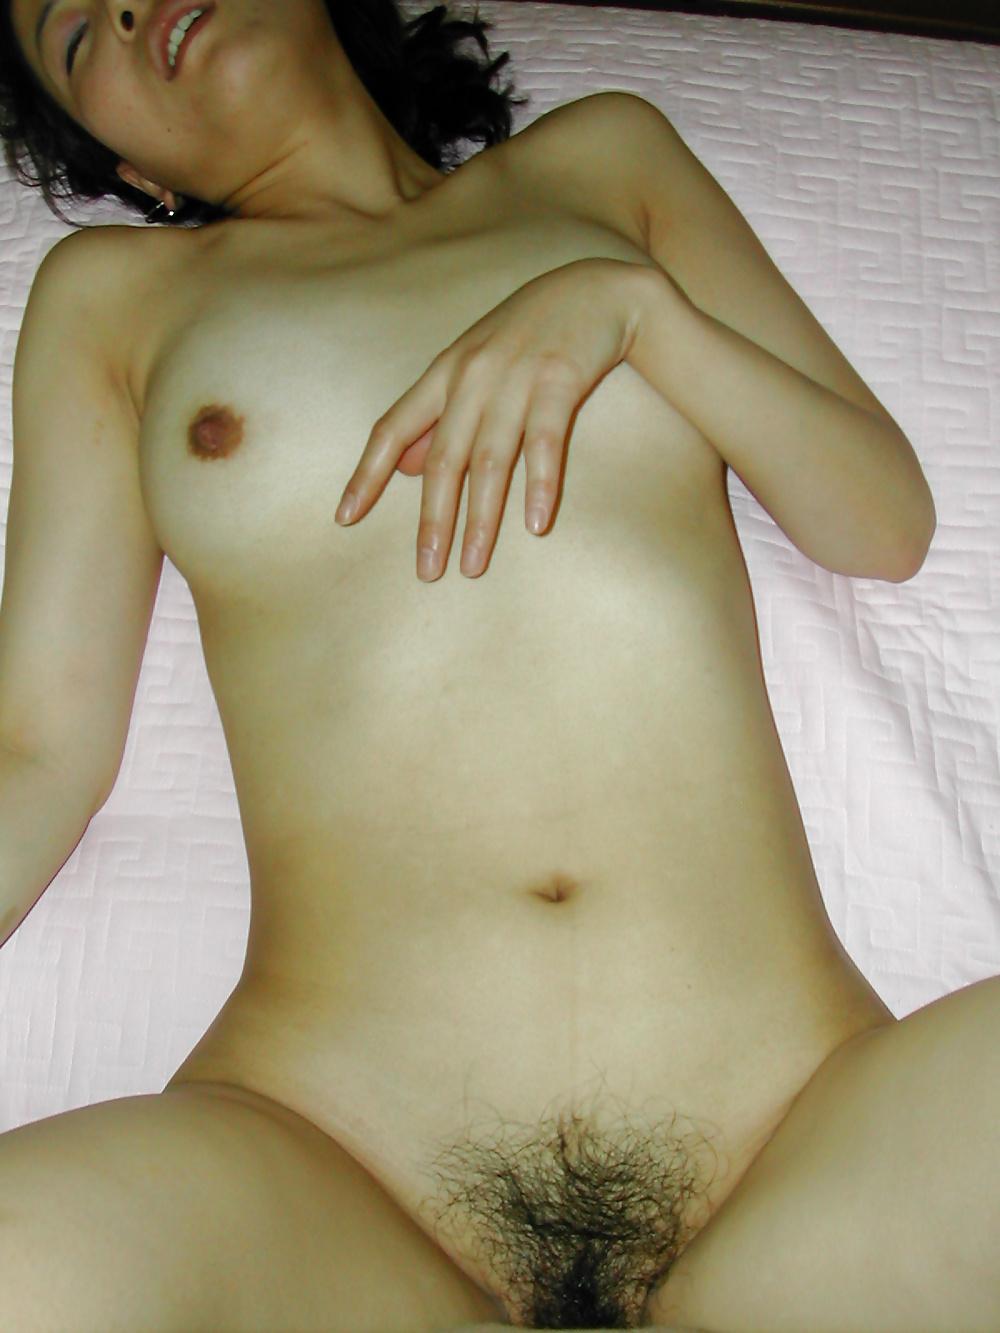 vaginal scrathes